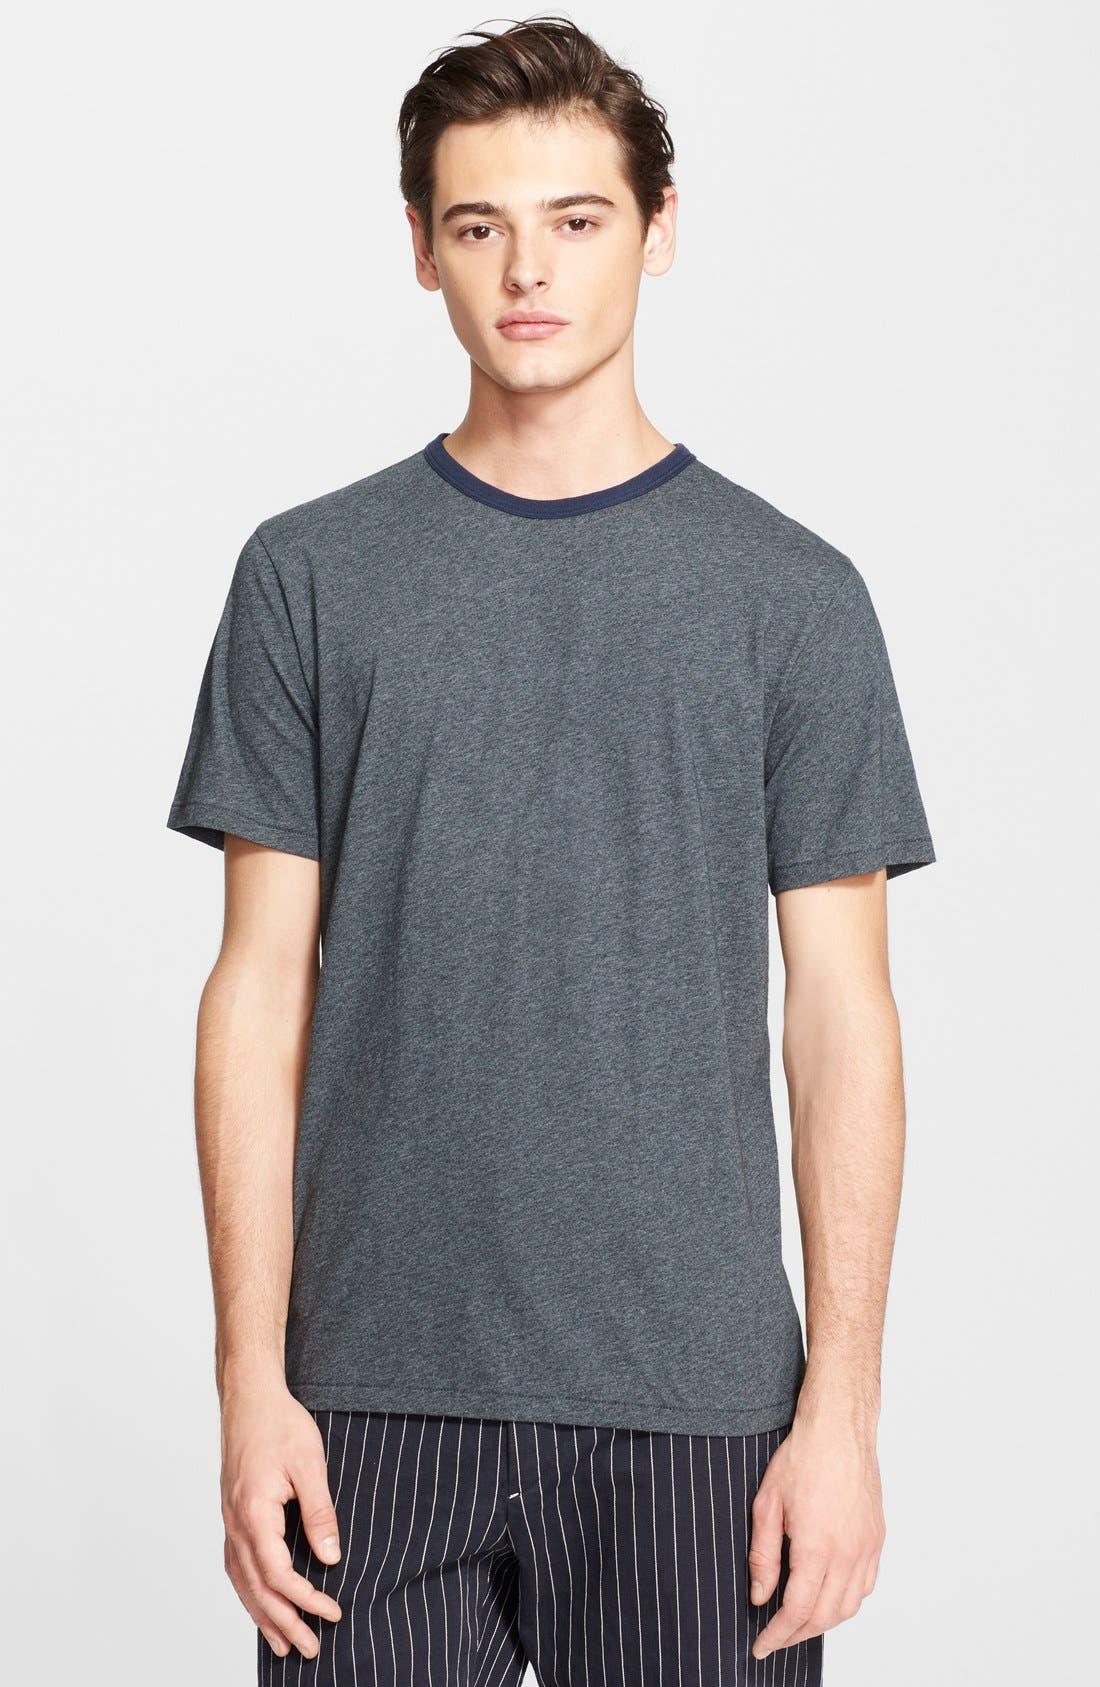 RAG & BONE, Ringer T-Shirt, Main thumbnail 1, color, 050